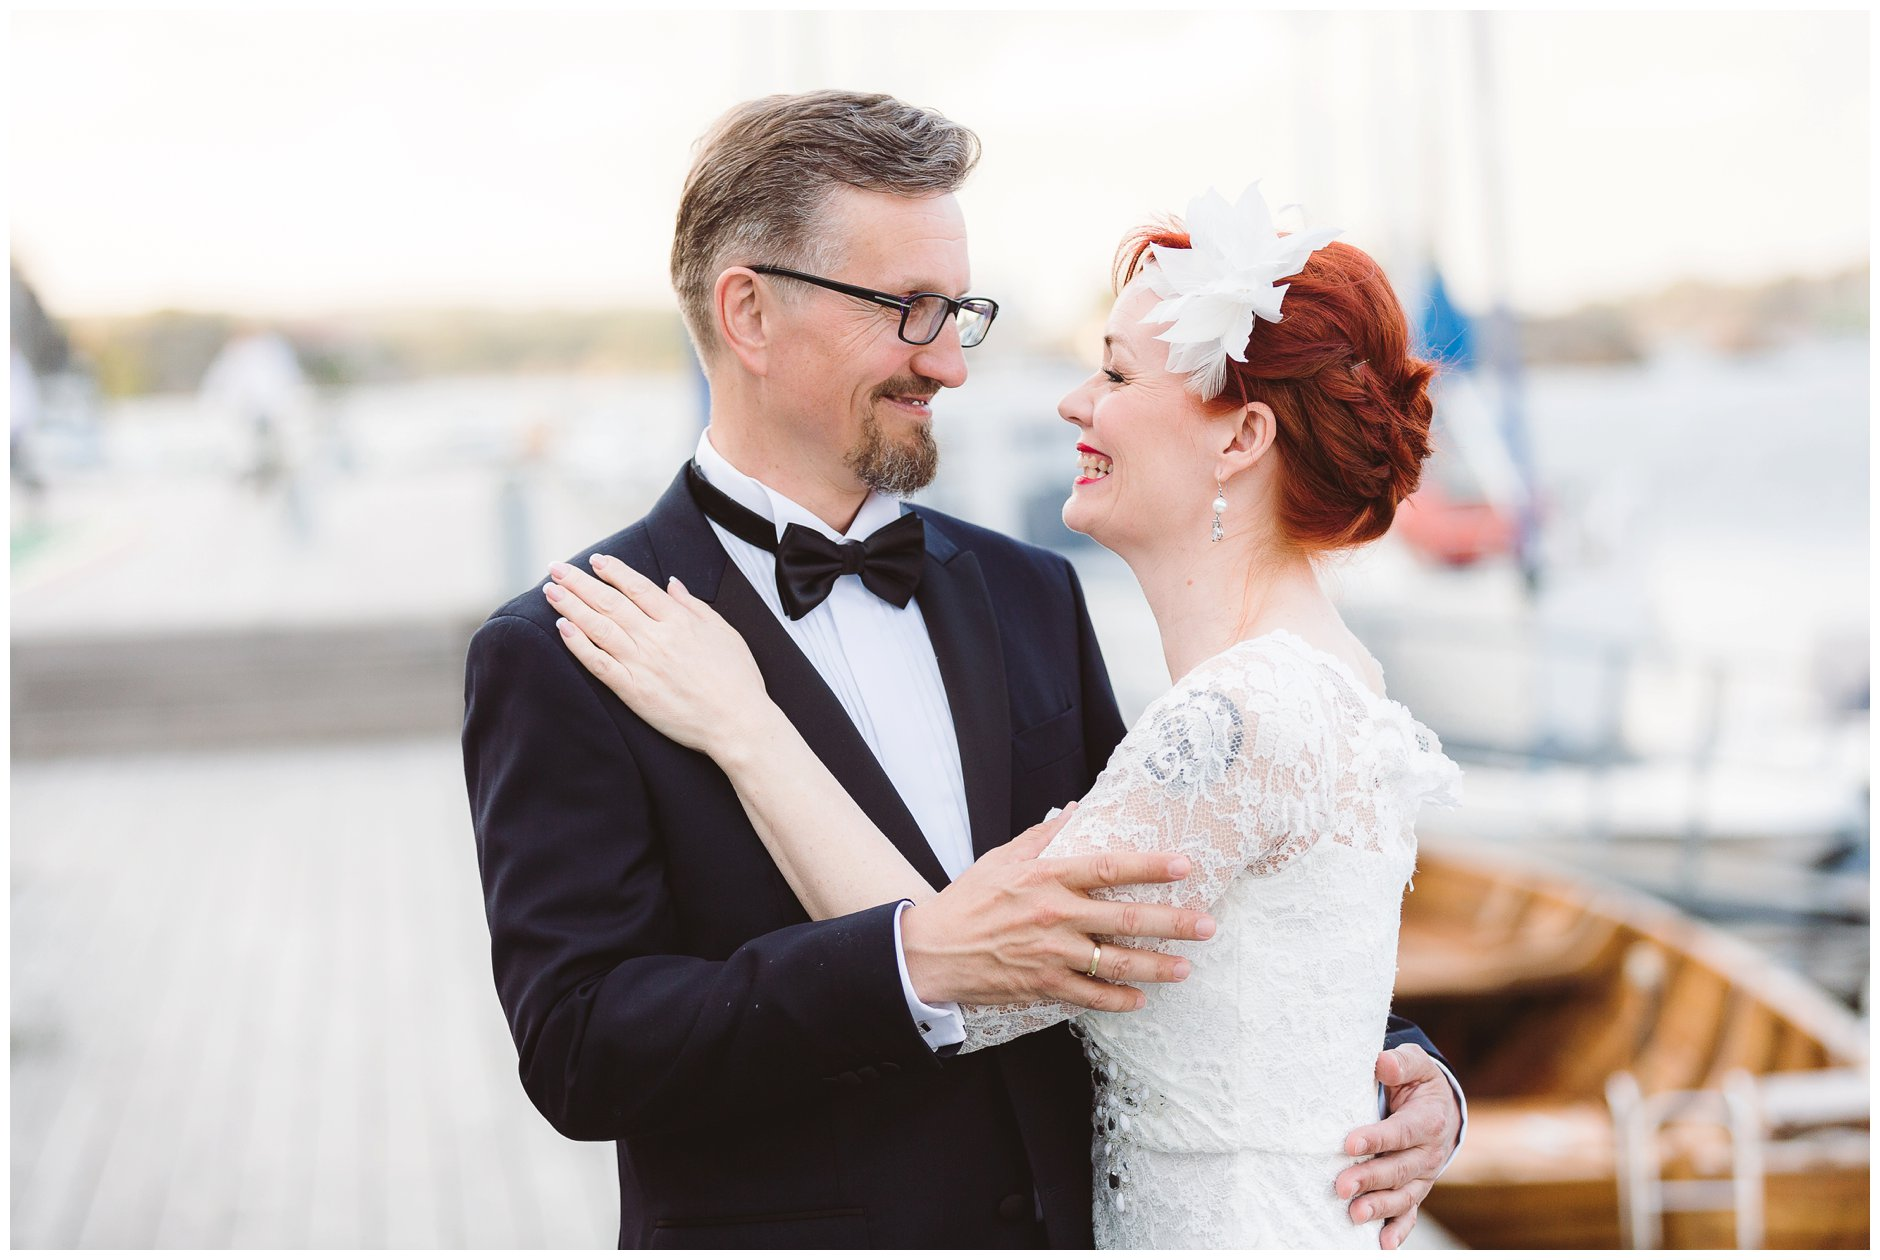 Bryllupsbilder på brygga Scandic hotell Tjøme